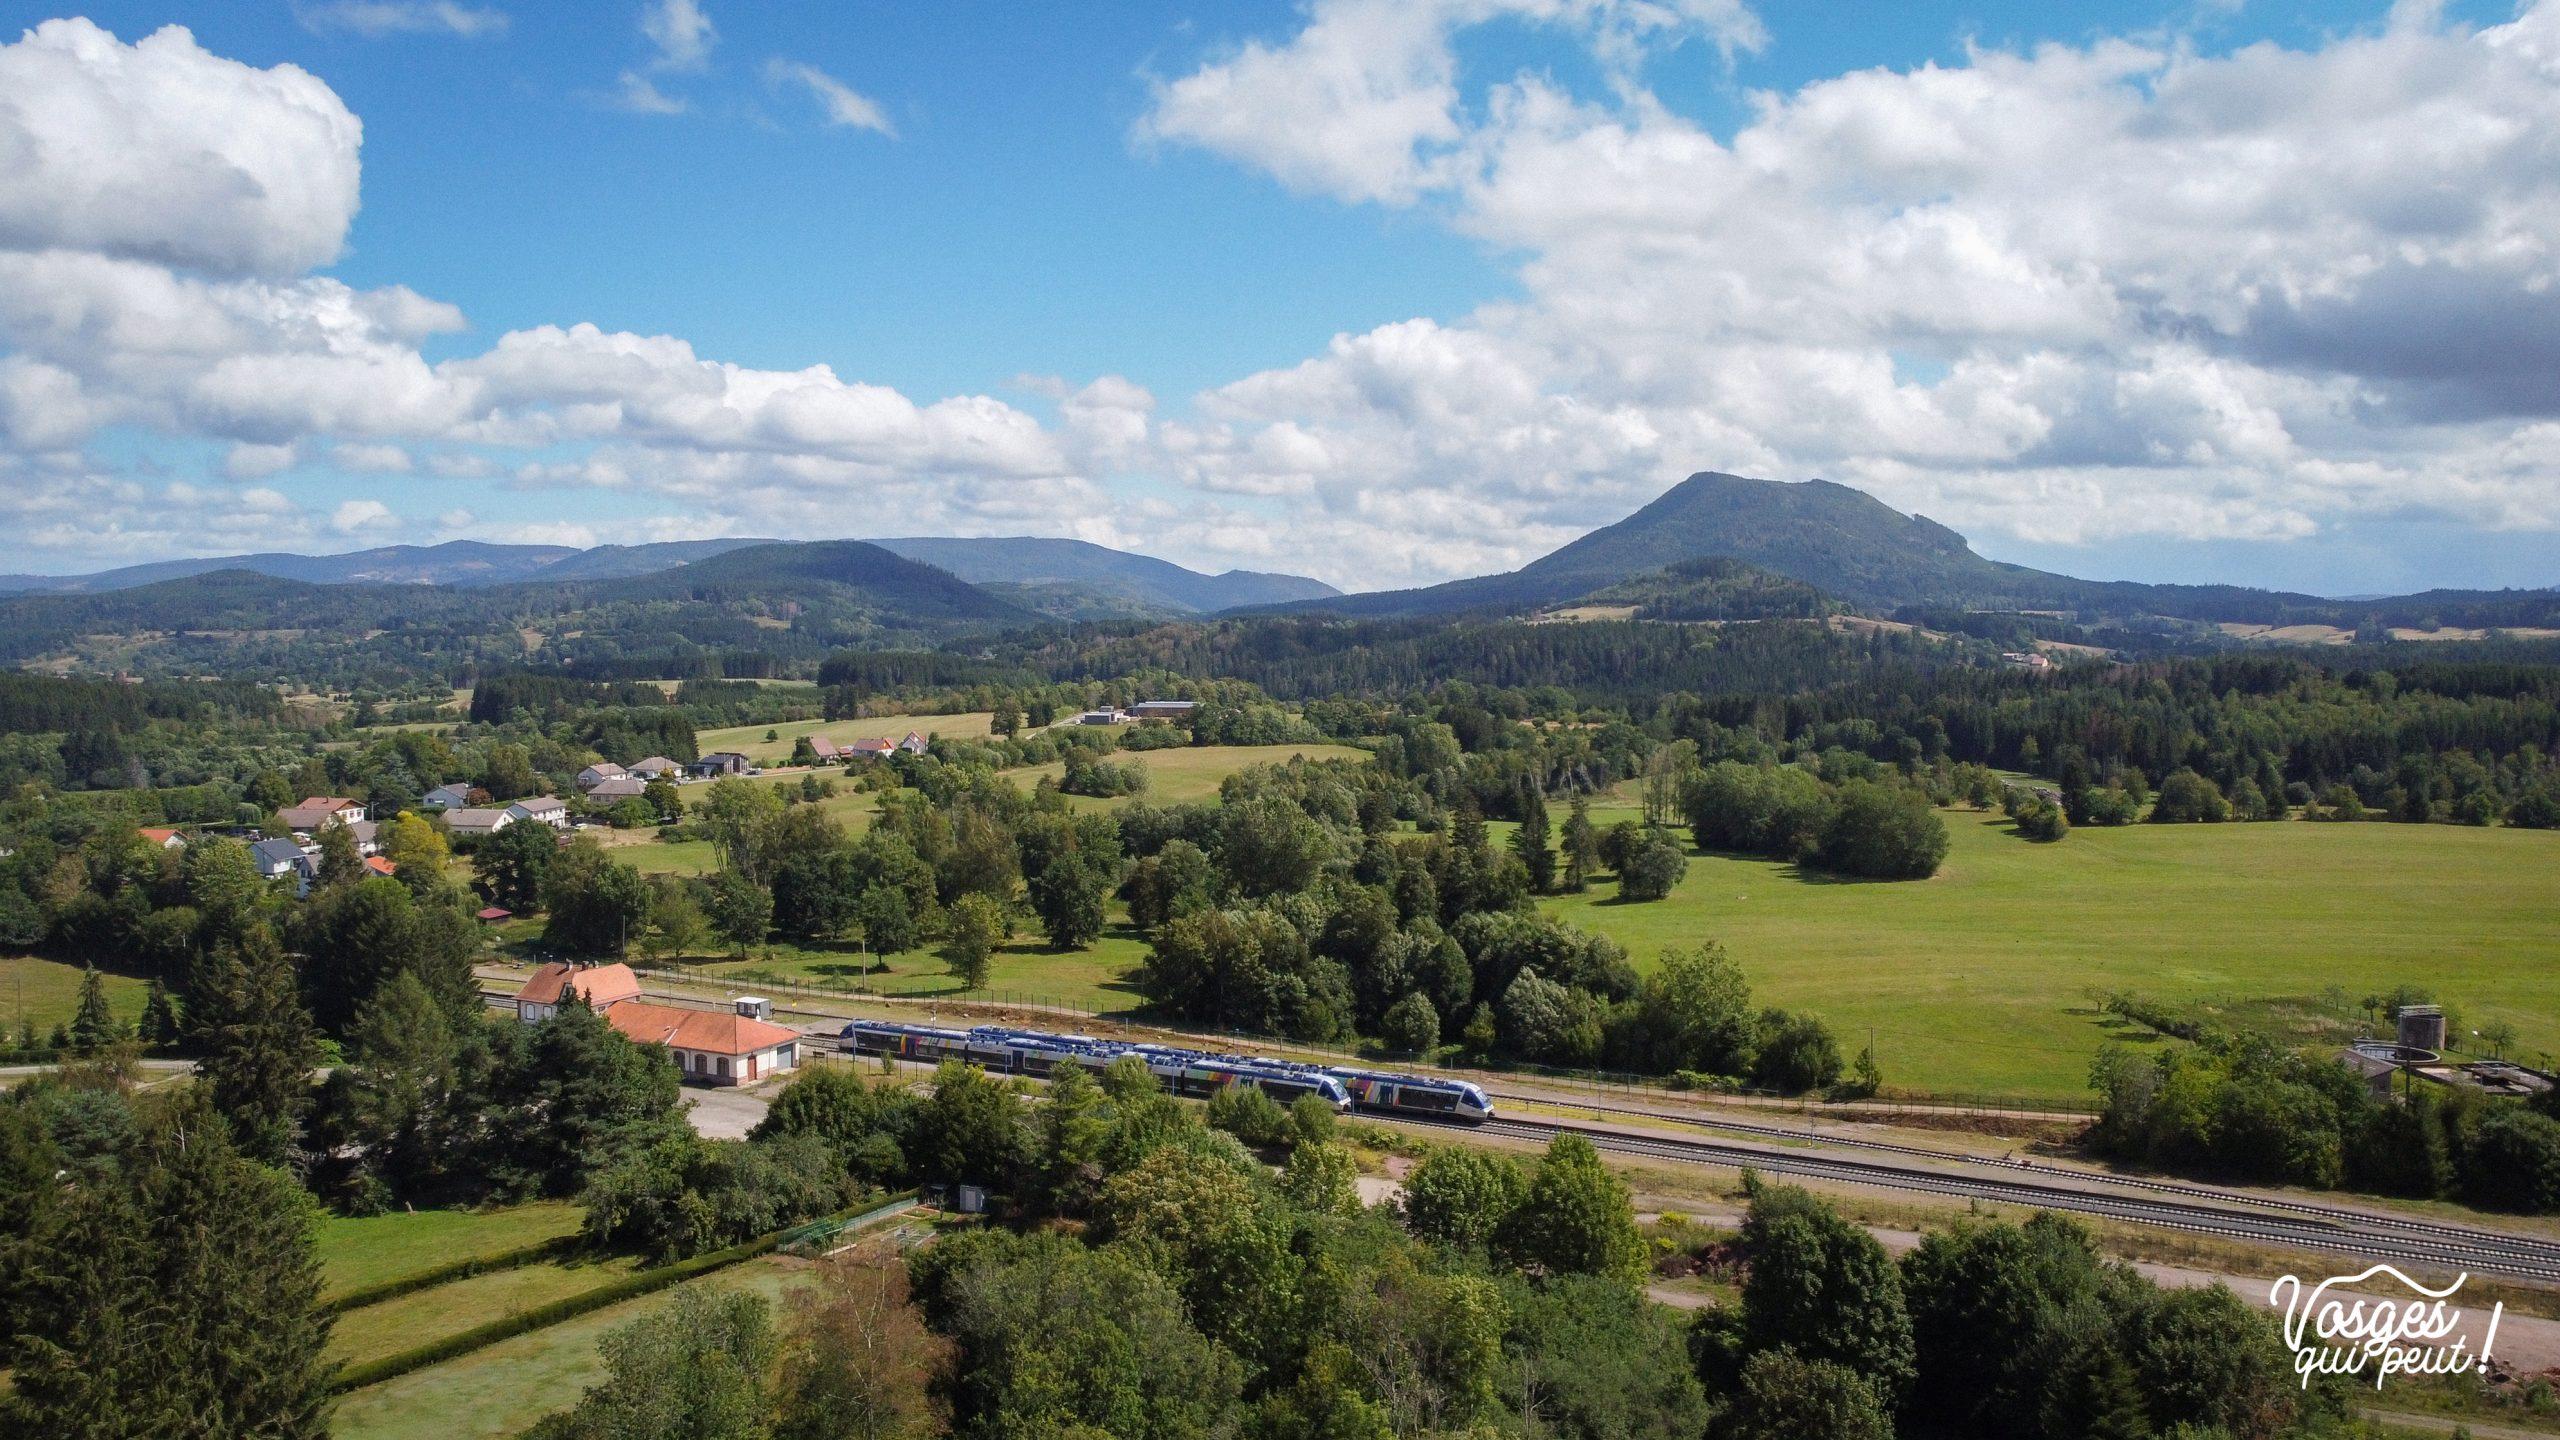 Gare de Saales dans la vallée de la Bruche, massif des Vosges